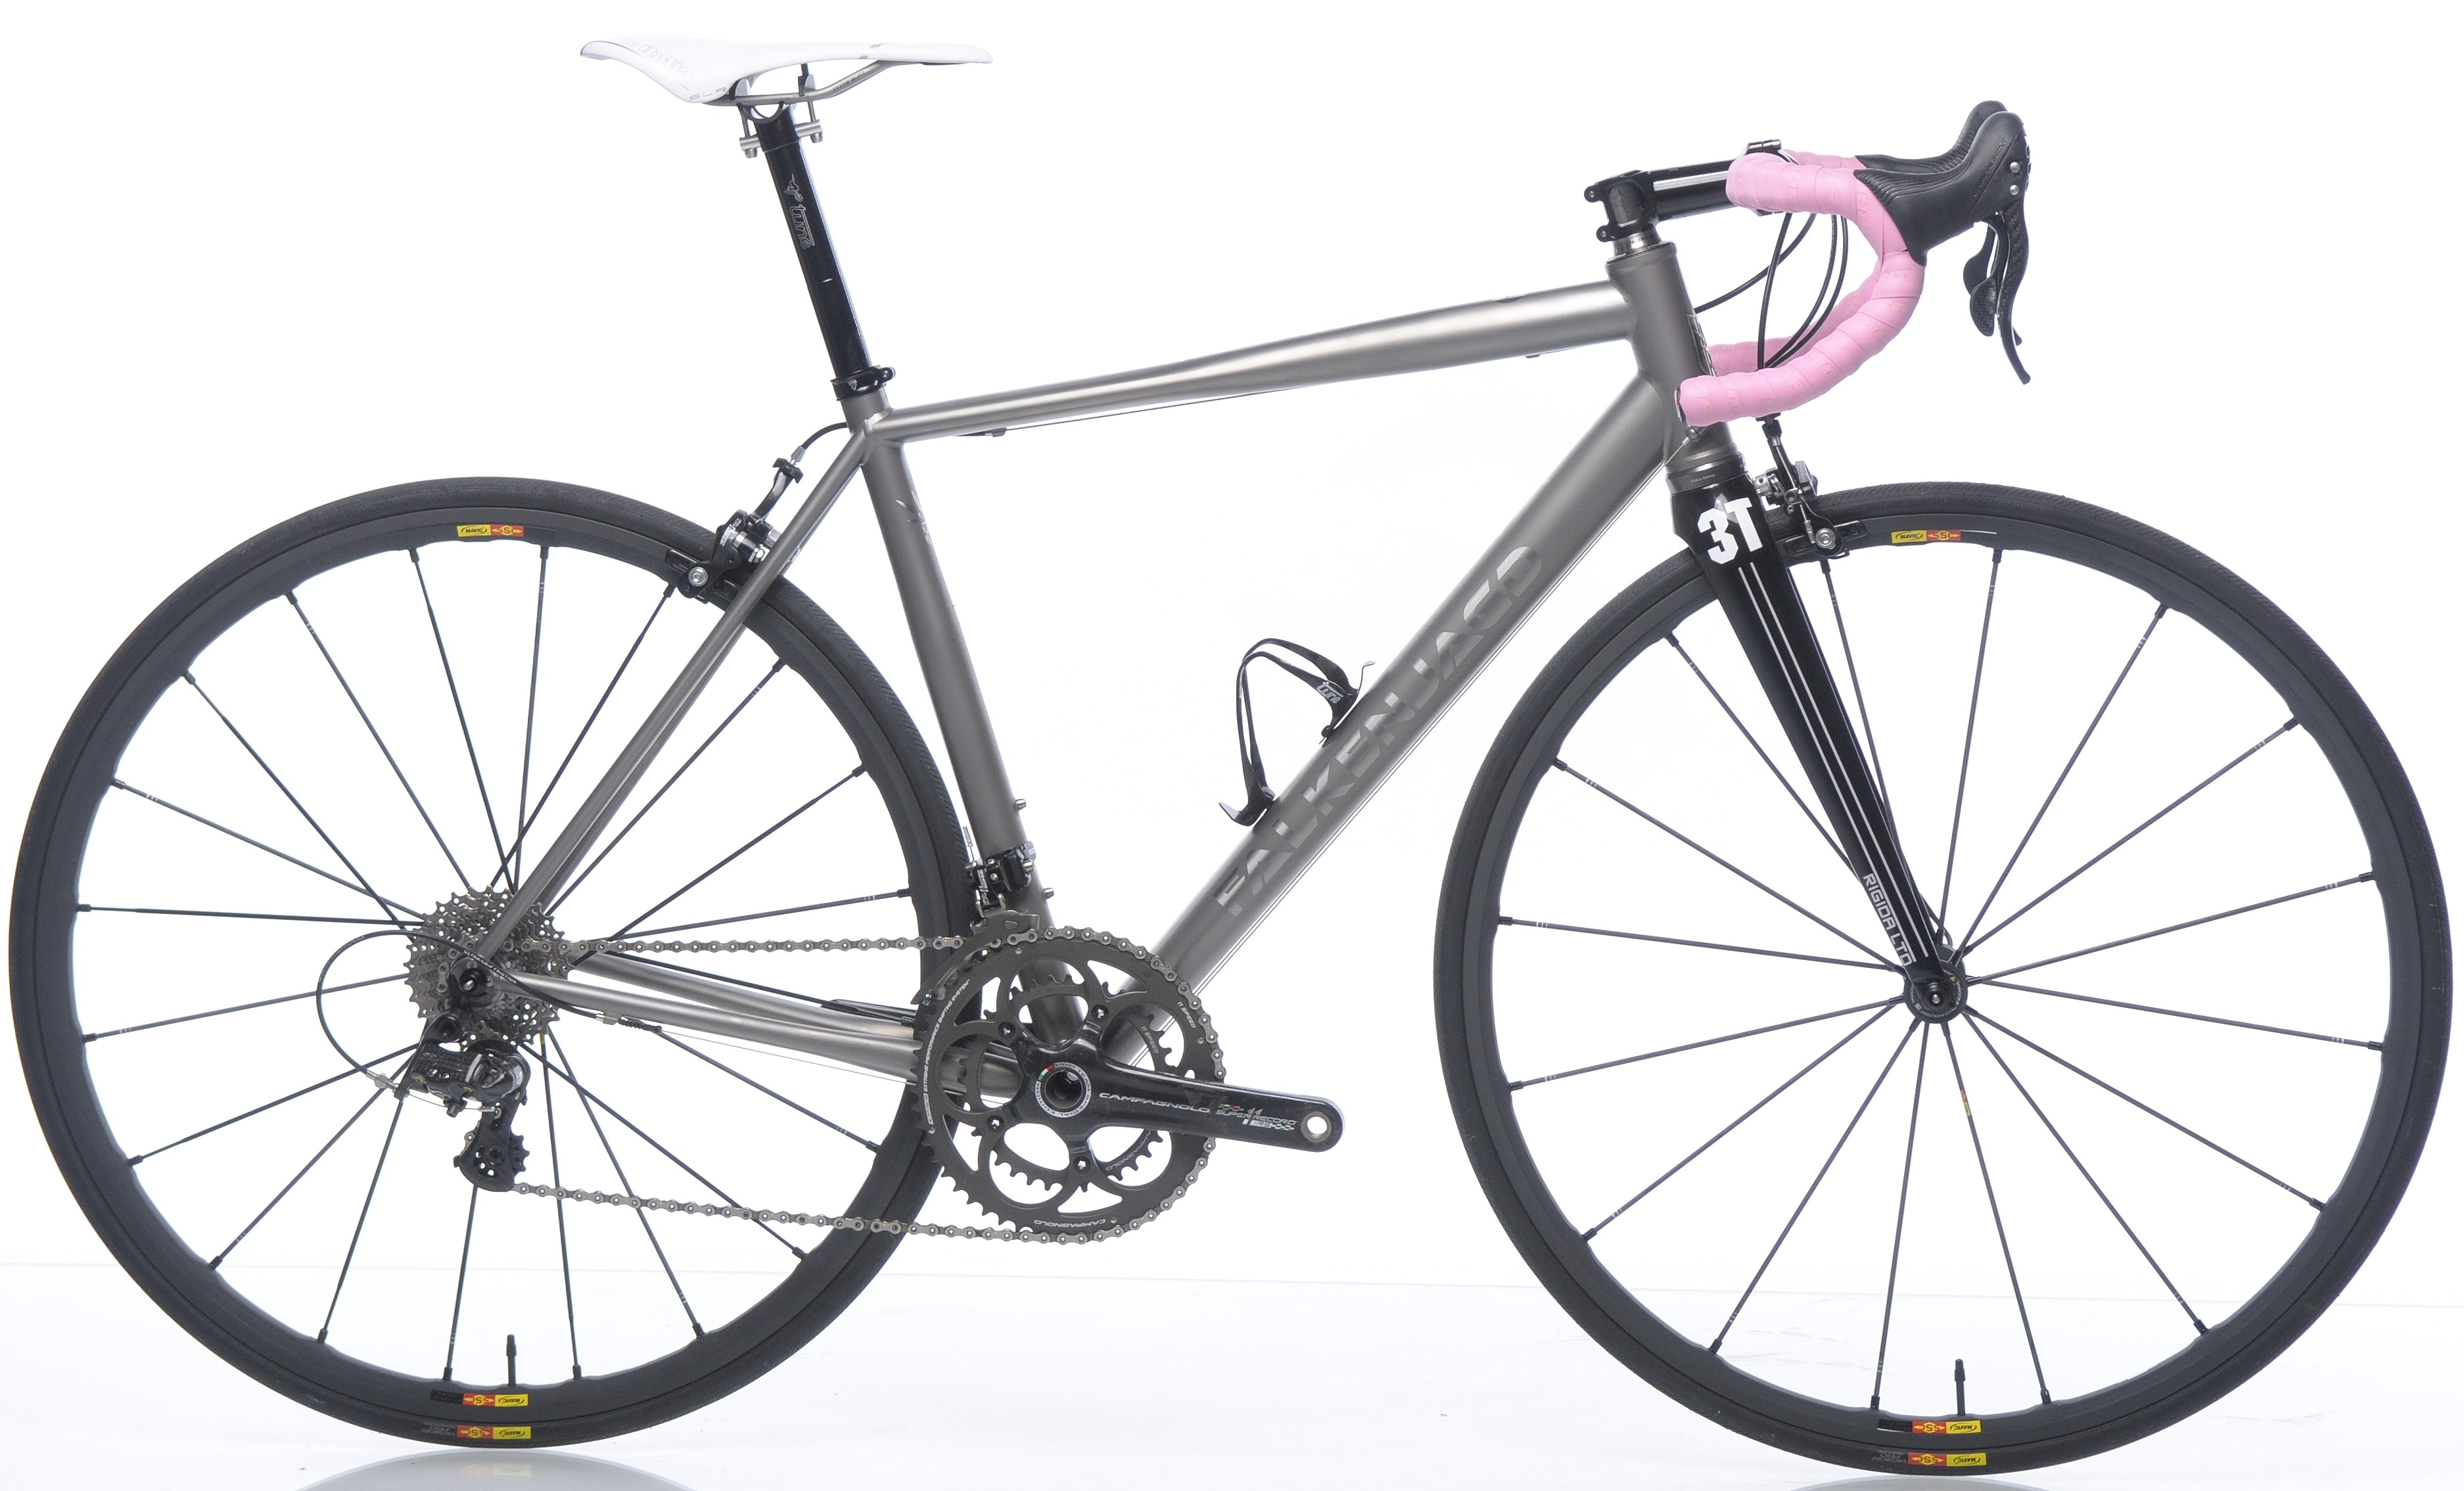 2015 Falkenjagd special editio ti campy pinkneuroticarnutzDean Ti road bike 2013 campy record